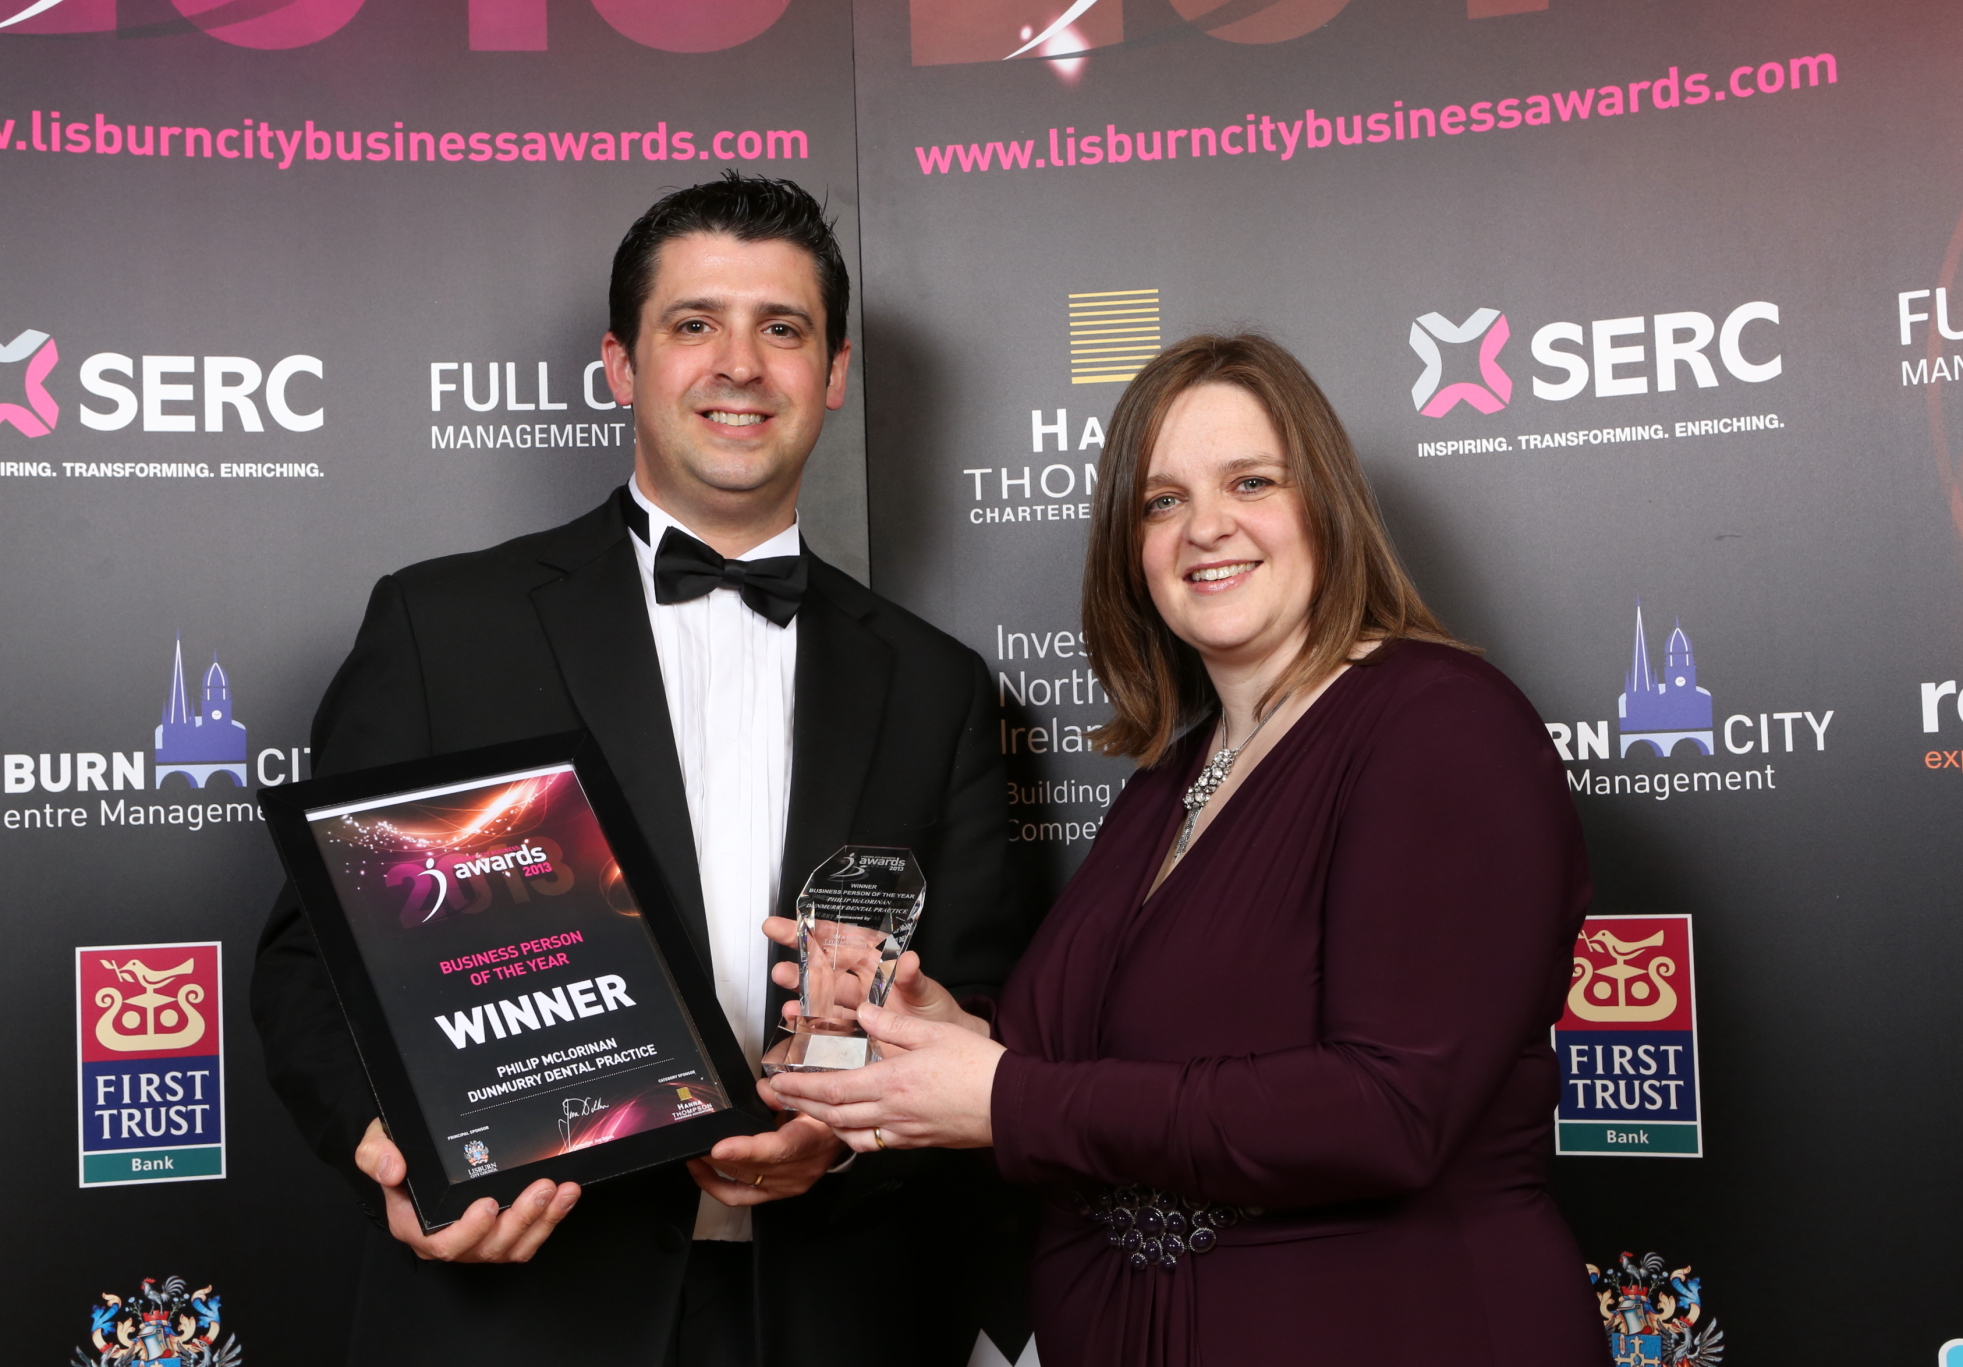 Business awards celebrate the best of Lisburn